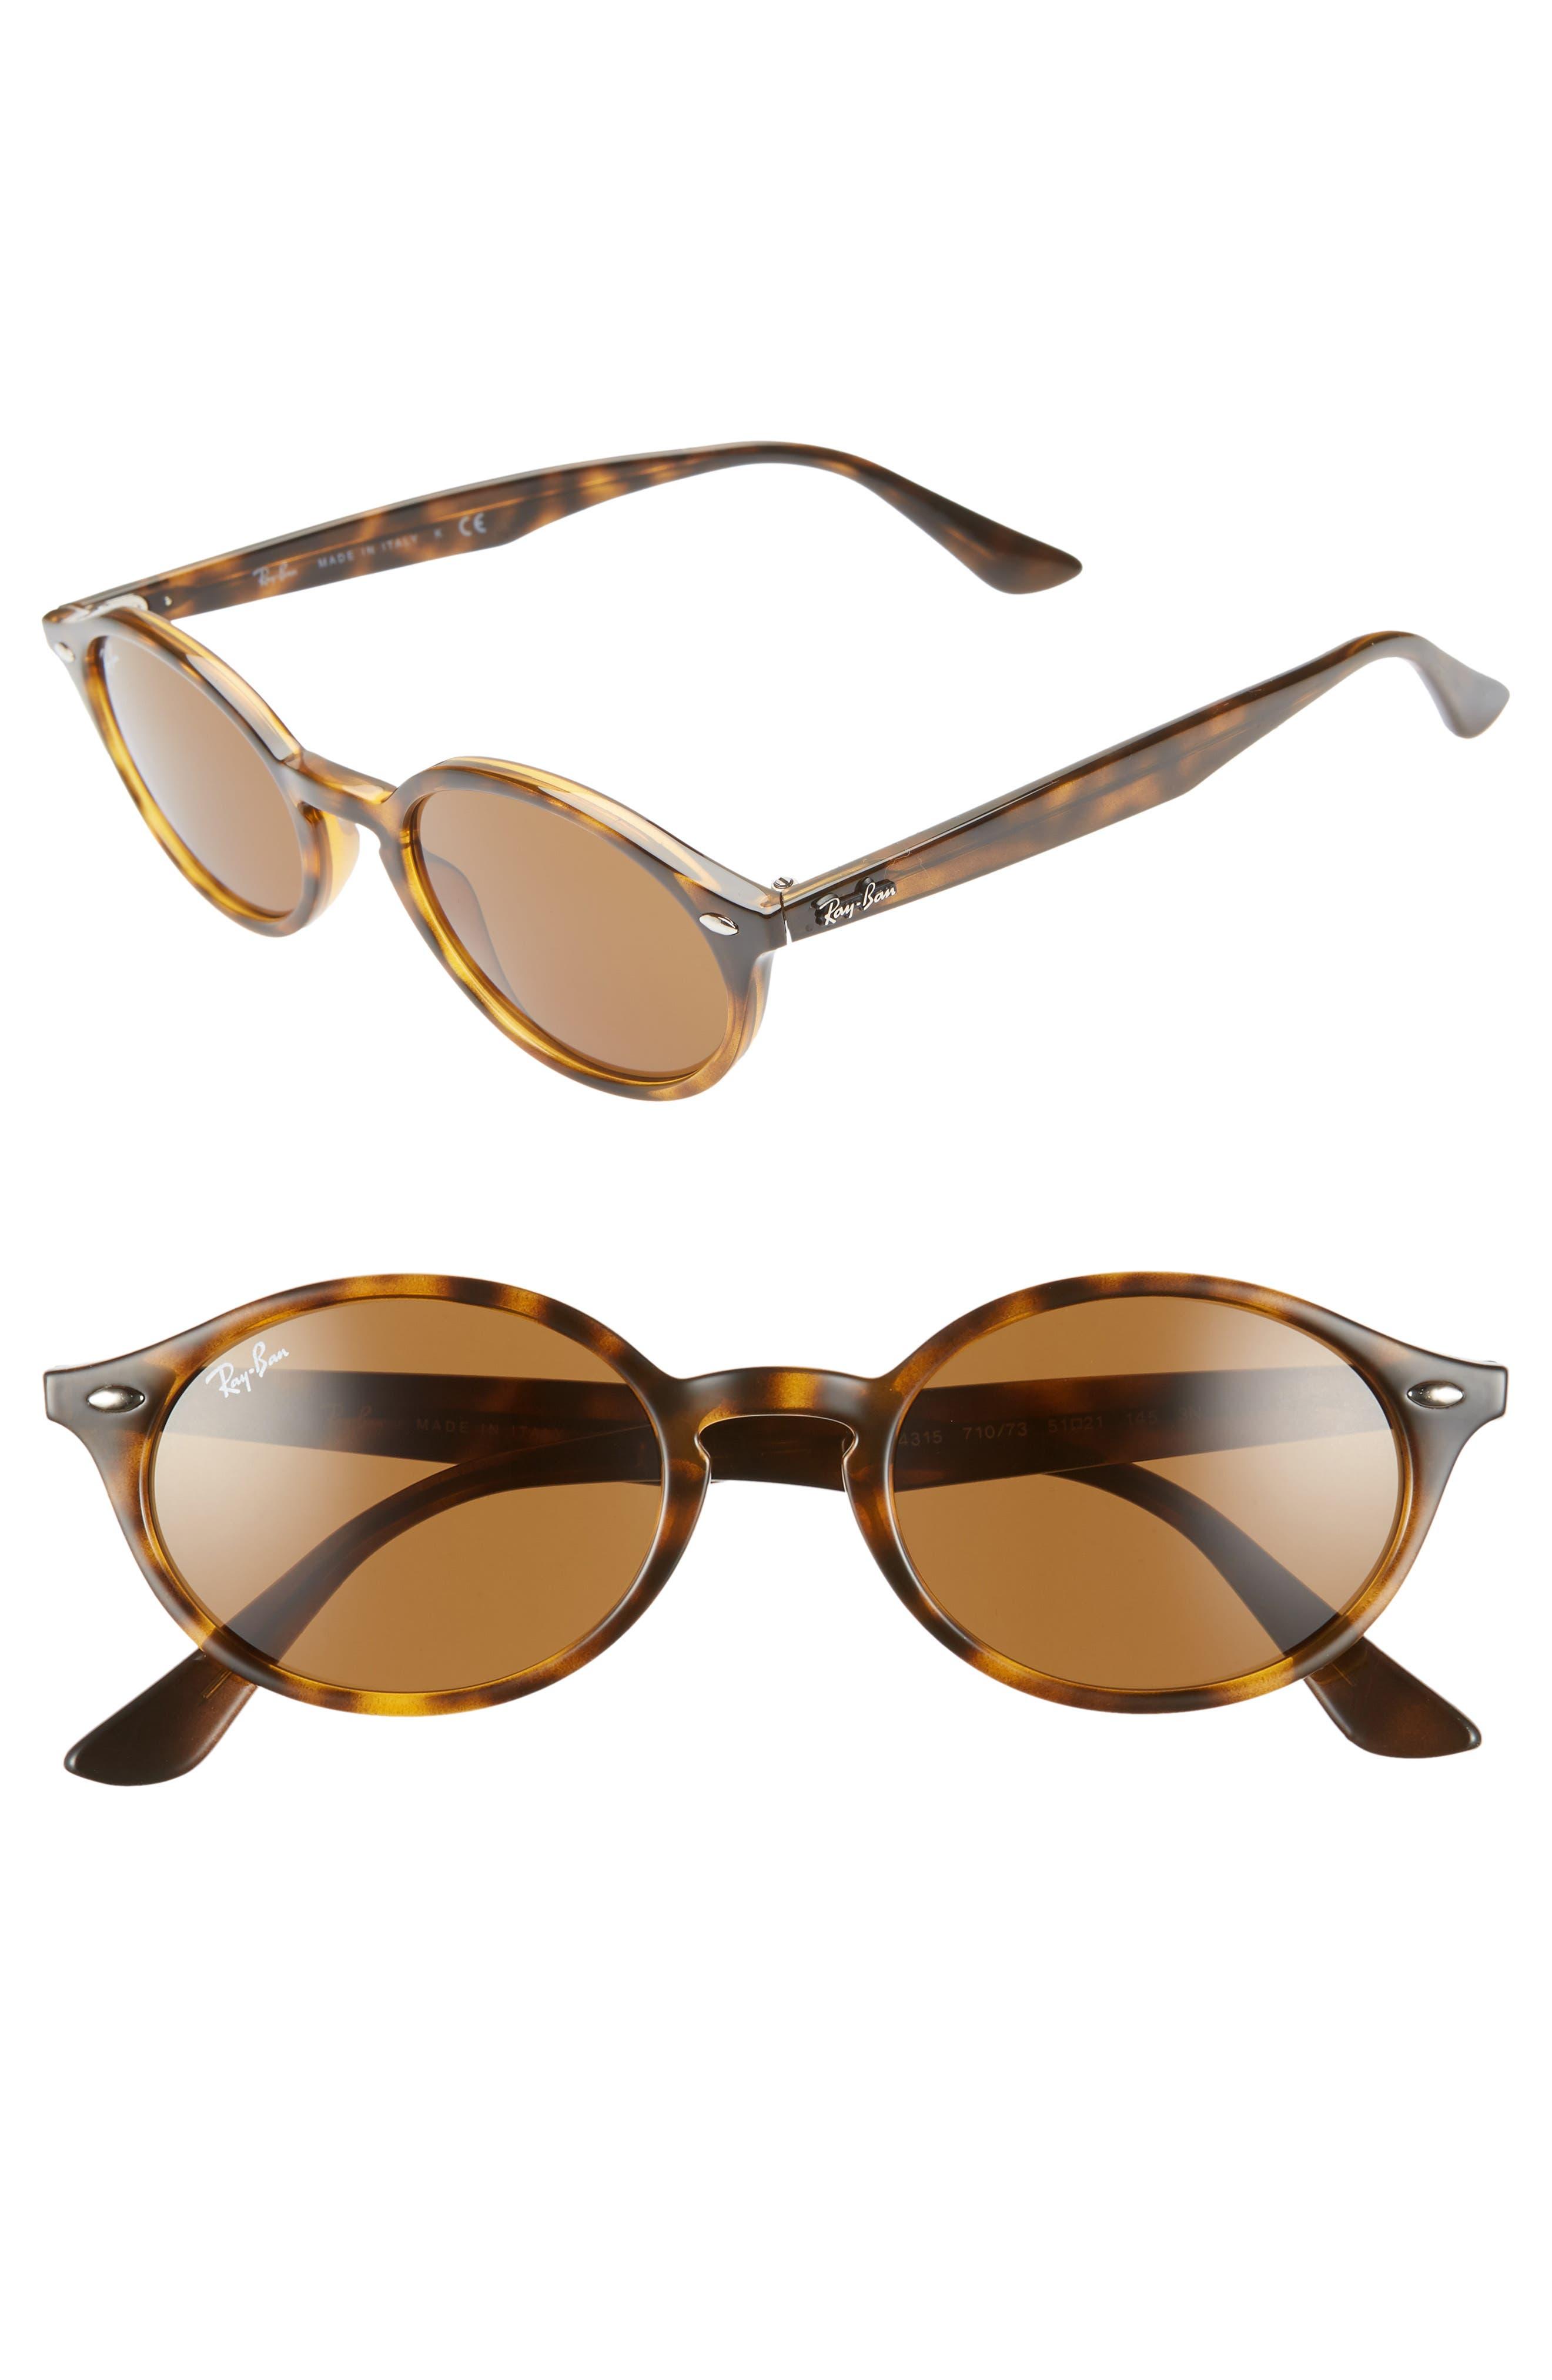 Ray-Ban 51Mm Oval Sunglasses - Havana Solid